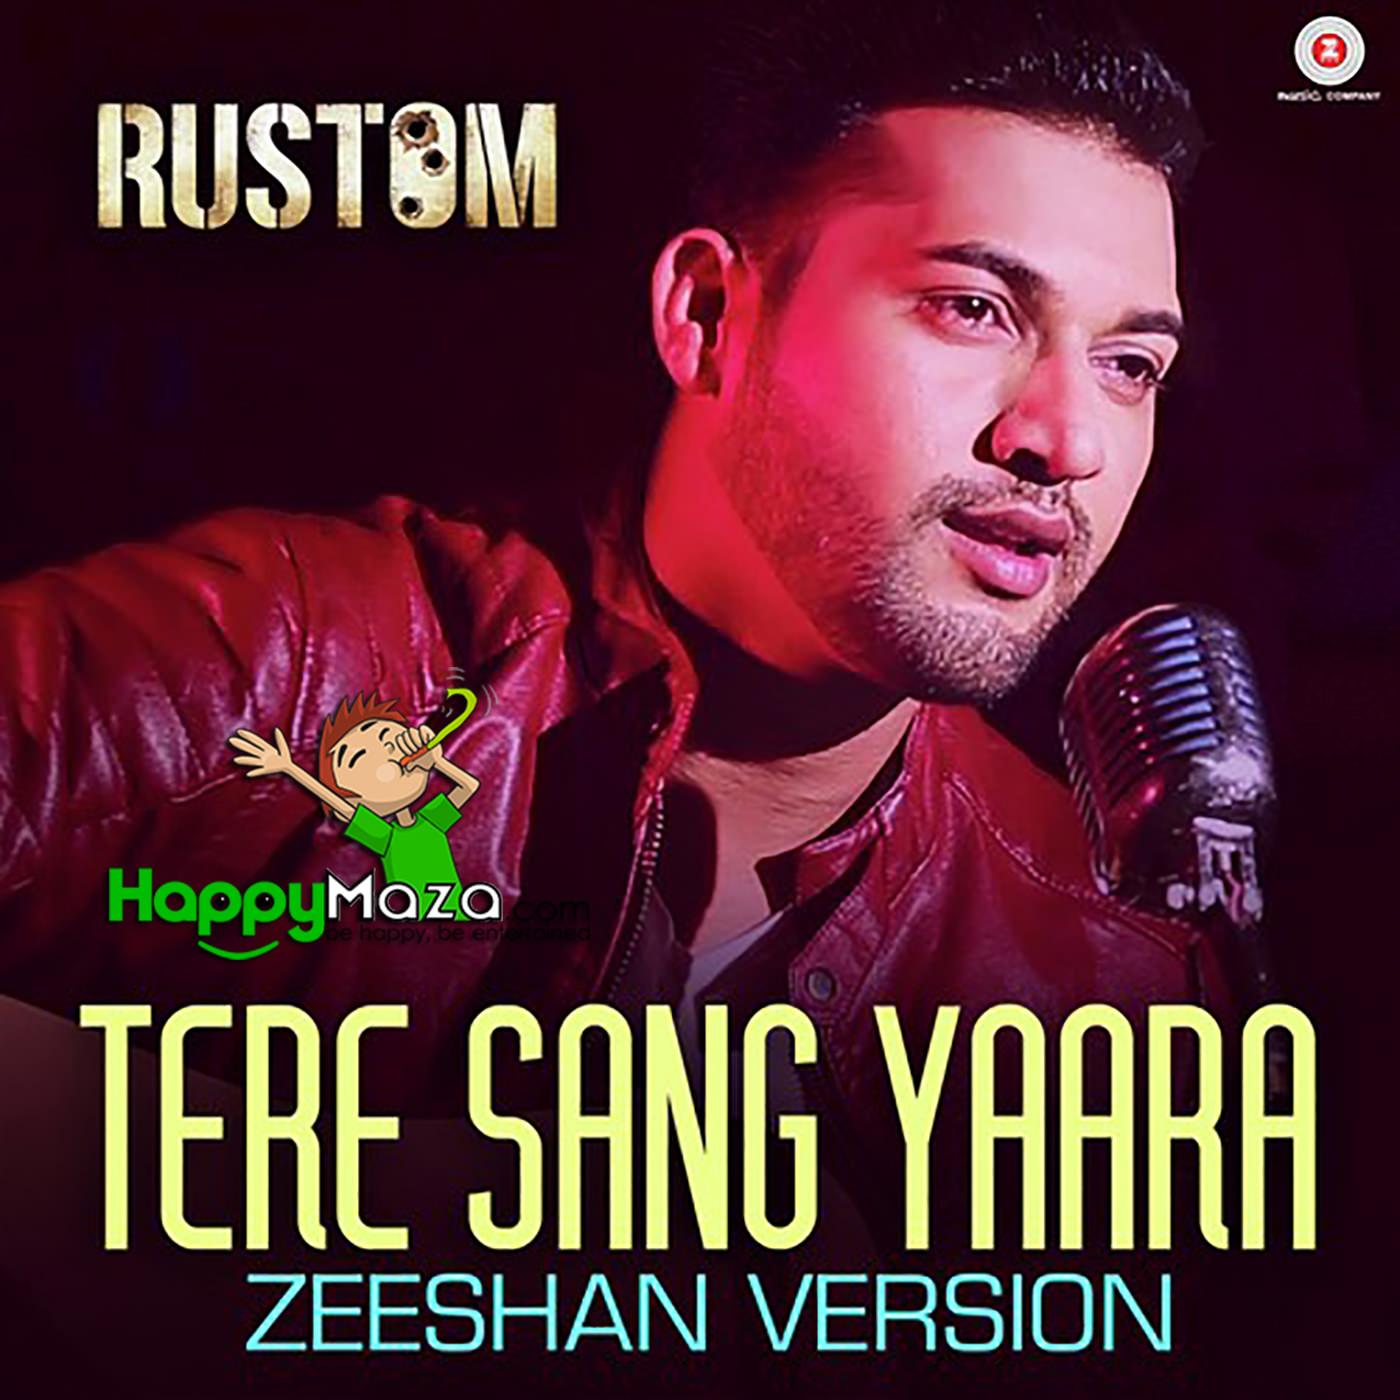 Mera Tu Hi Bas Yaara Mp3 Song Download: Tere Sang Yaara Lyrics - Zeeshan Version - 2017